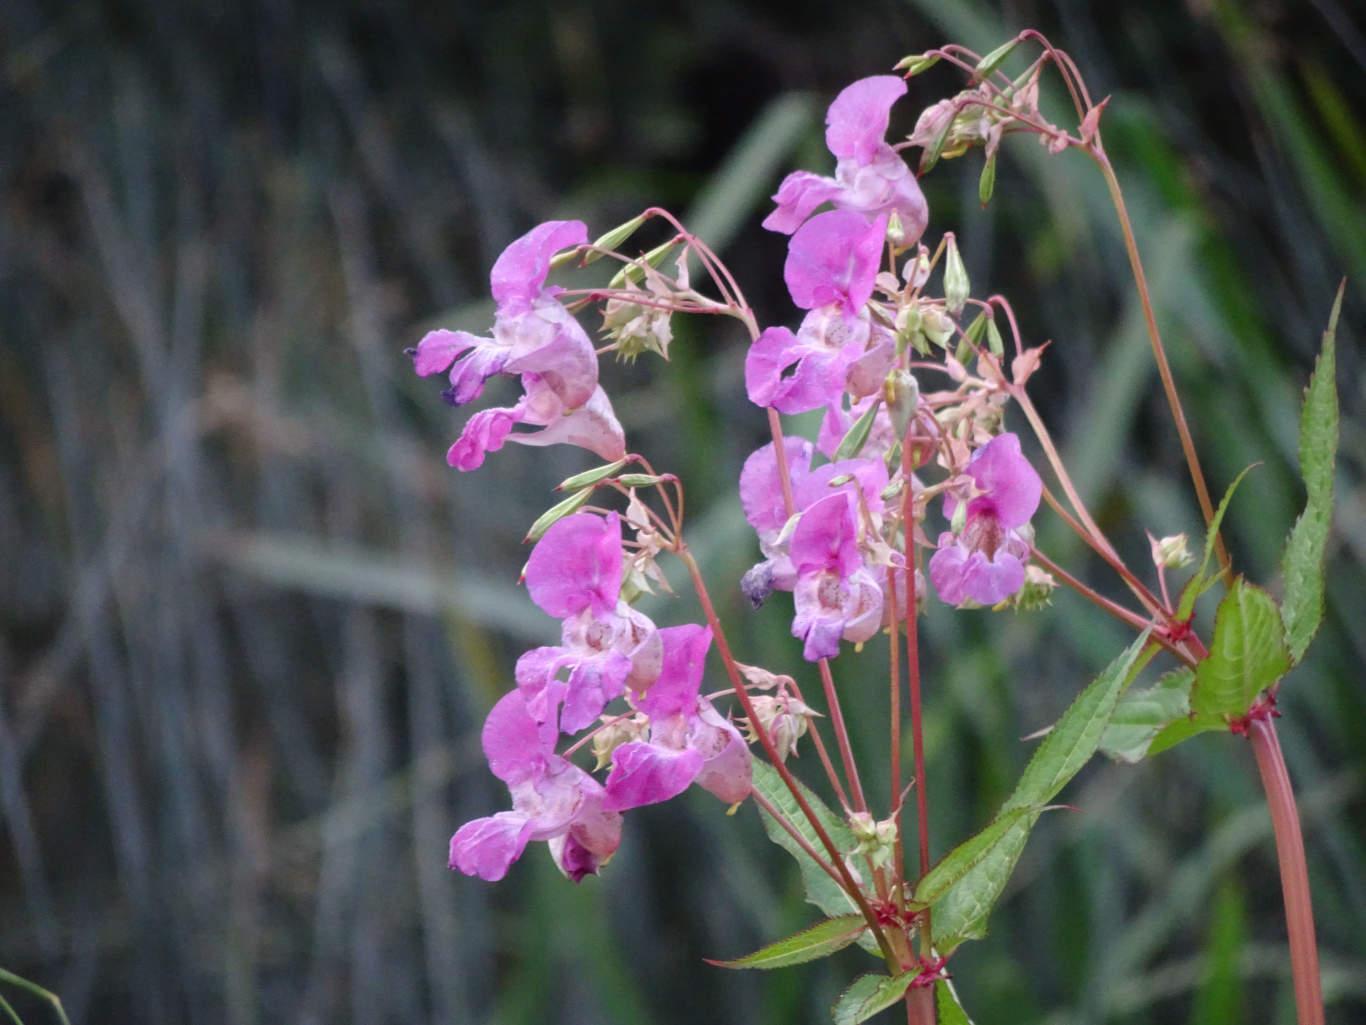 Himalayan balsam (Impatiens glandulifera) flowers